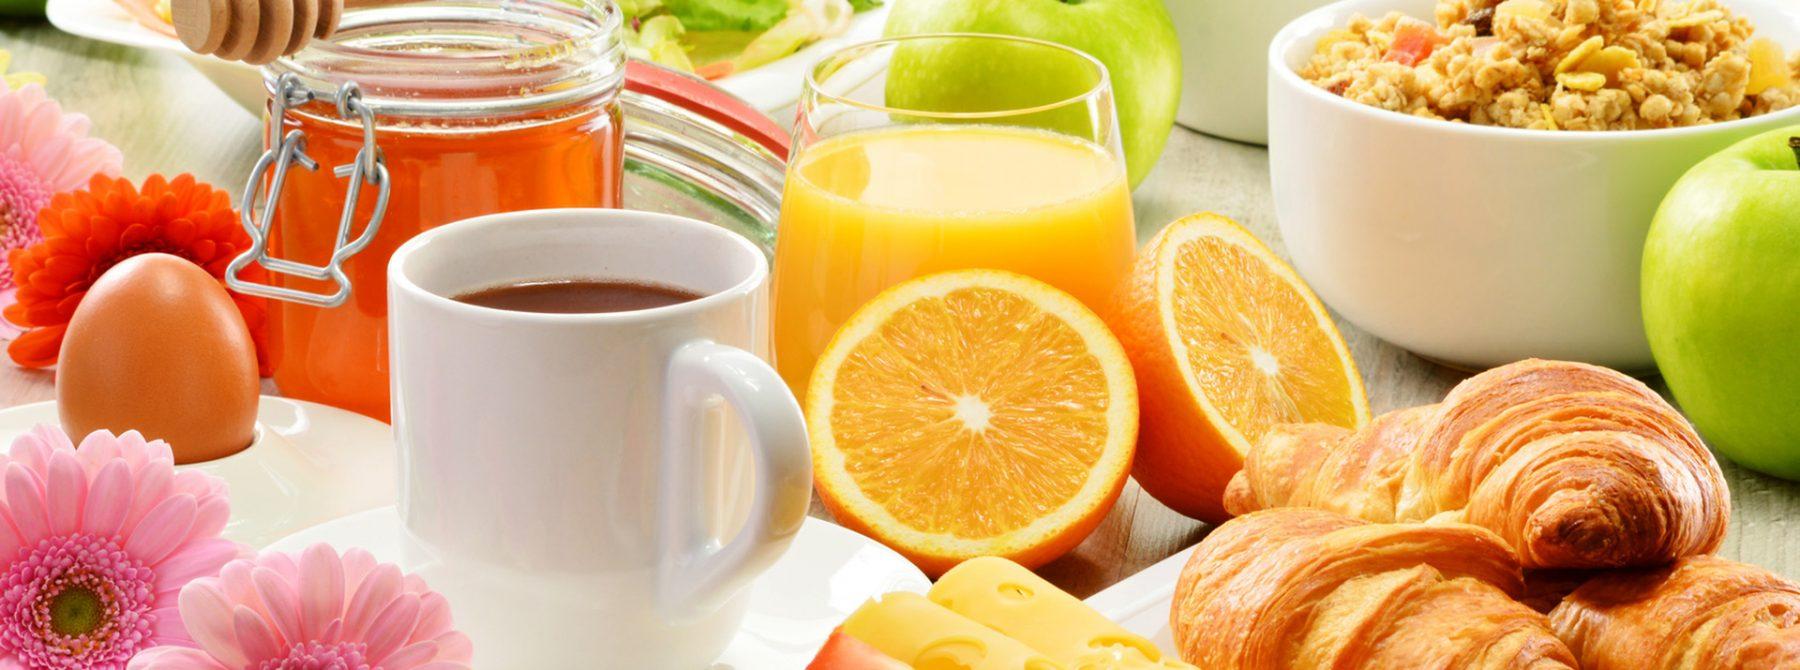 Charity-Frühstück